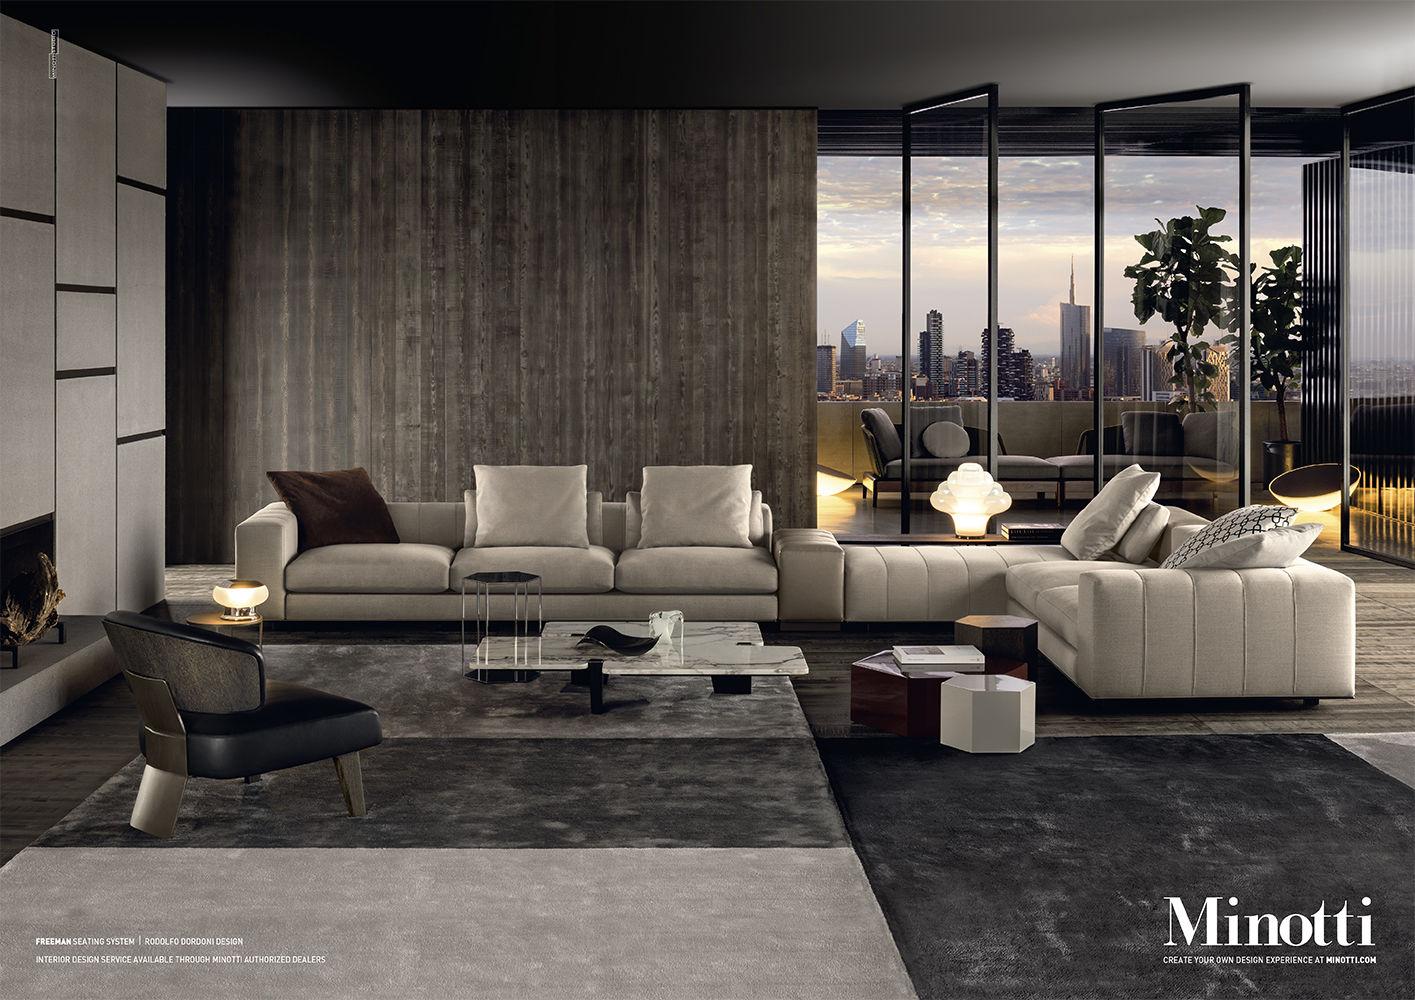 Neuer einrichtungs showroom f r designm bel auf ber 2 for Divani per terrazzi